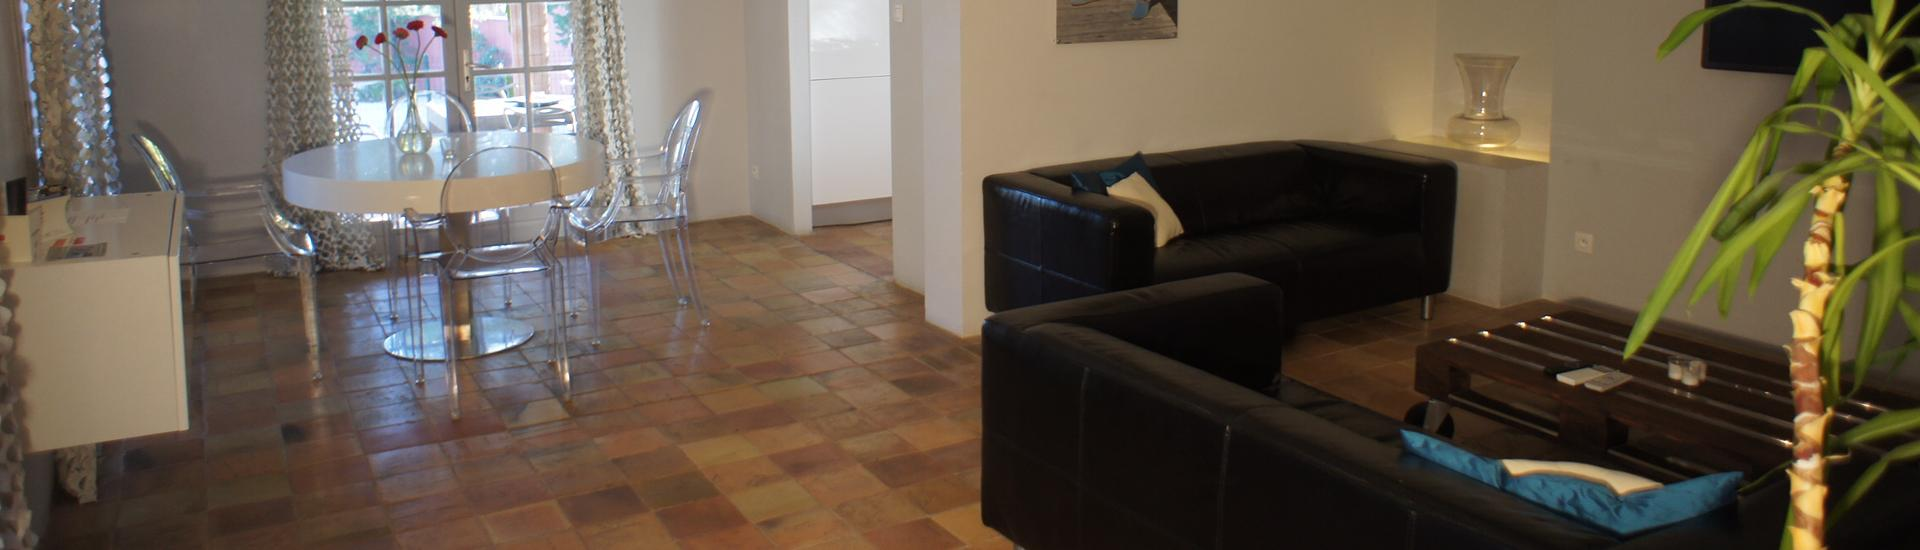 Appartement 72 en 105m2 woonkamer